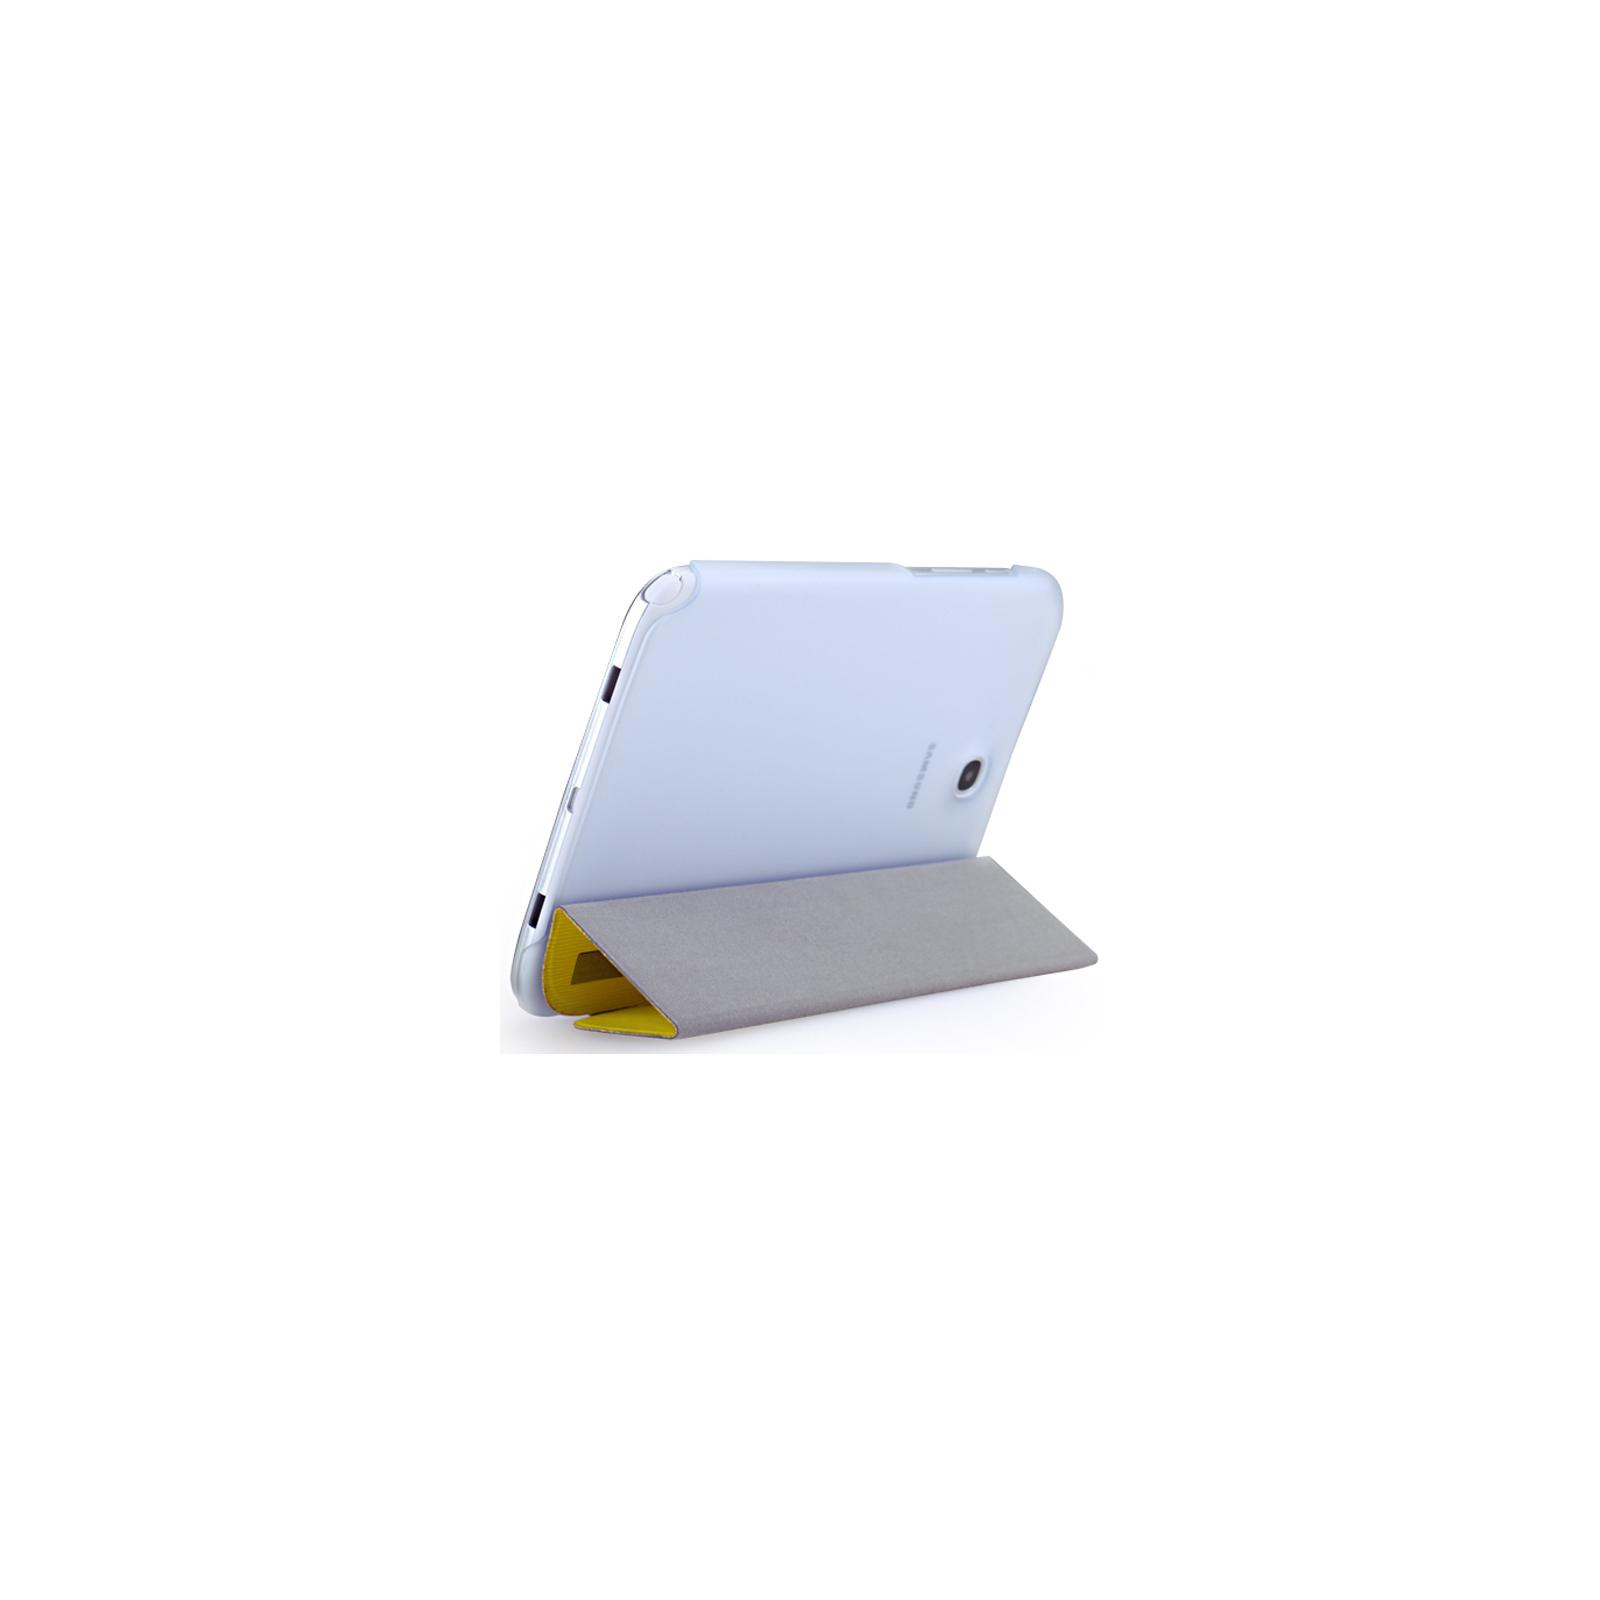 "Чехол для планшета Rock 8"" Rock Samsung Note 8.0 N5100 new elegant series lemon yell (6950290628306) изображение 3"